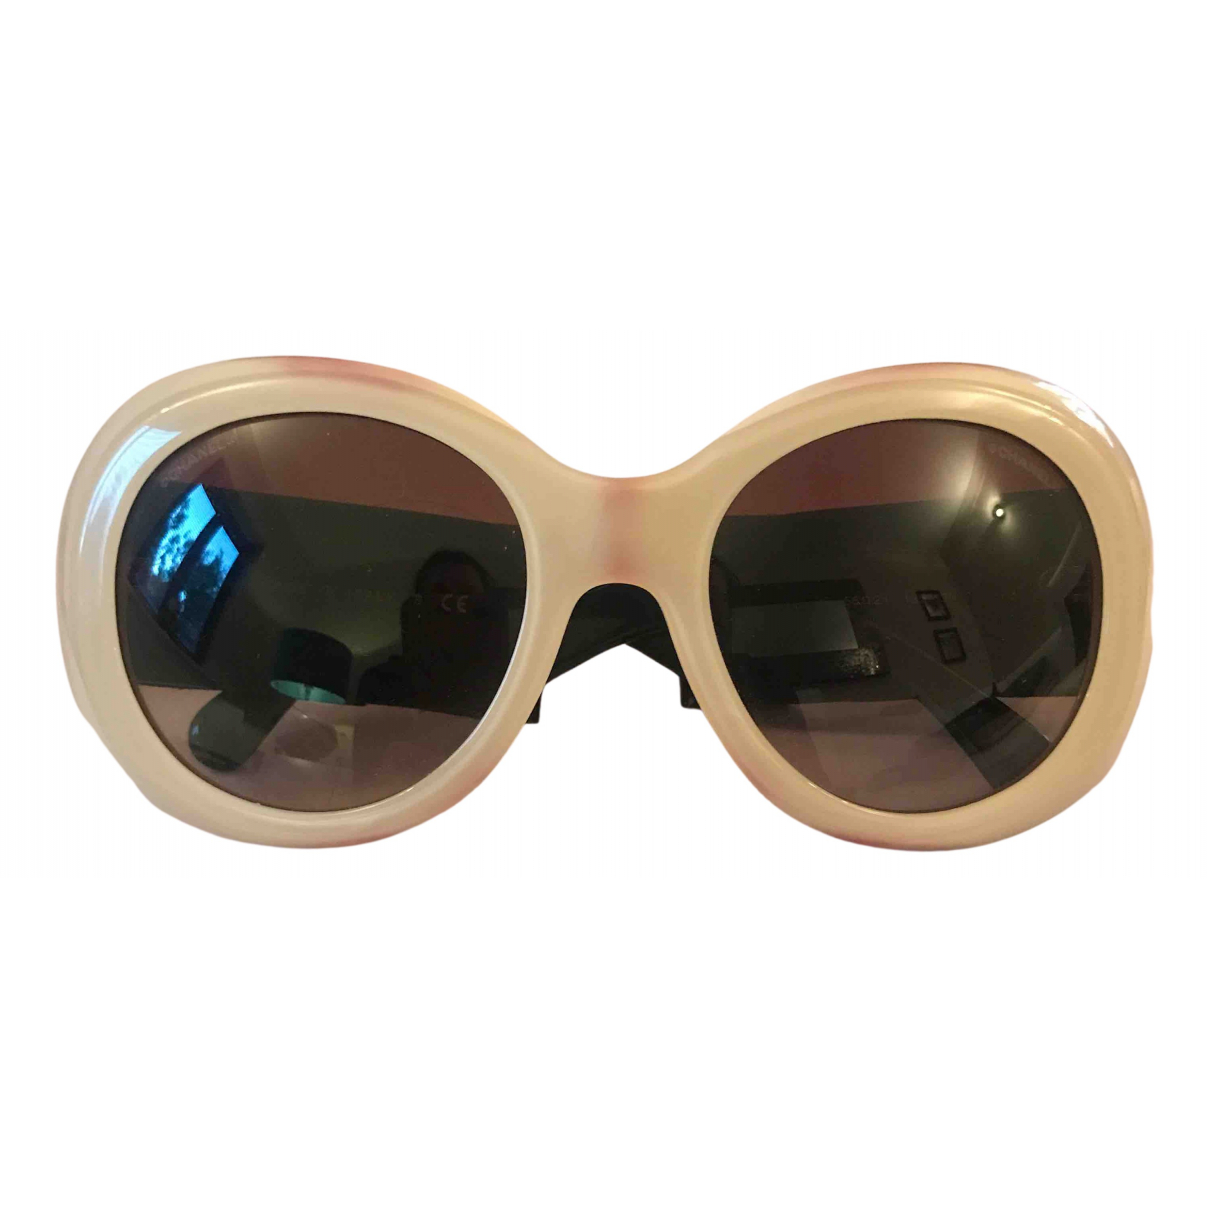 Chanel \N Sonnenbrillen in  Beige Kunststoff